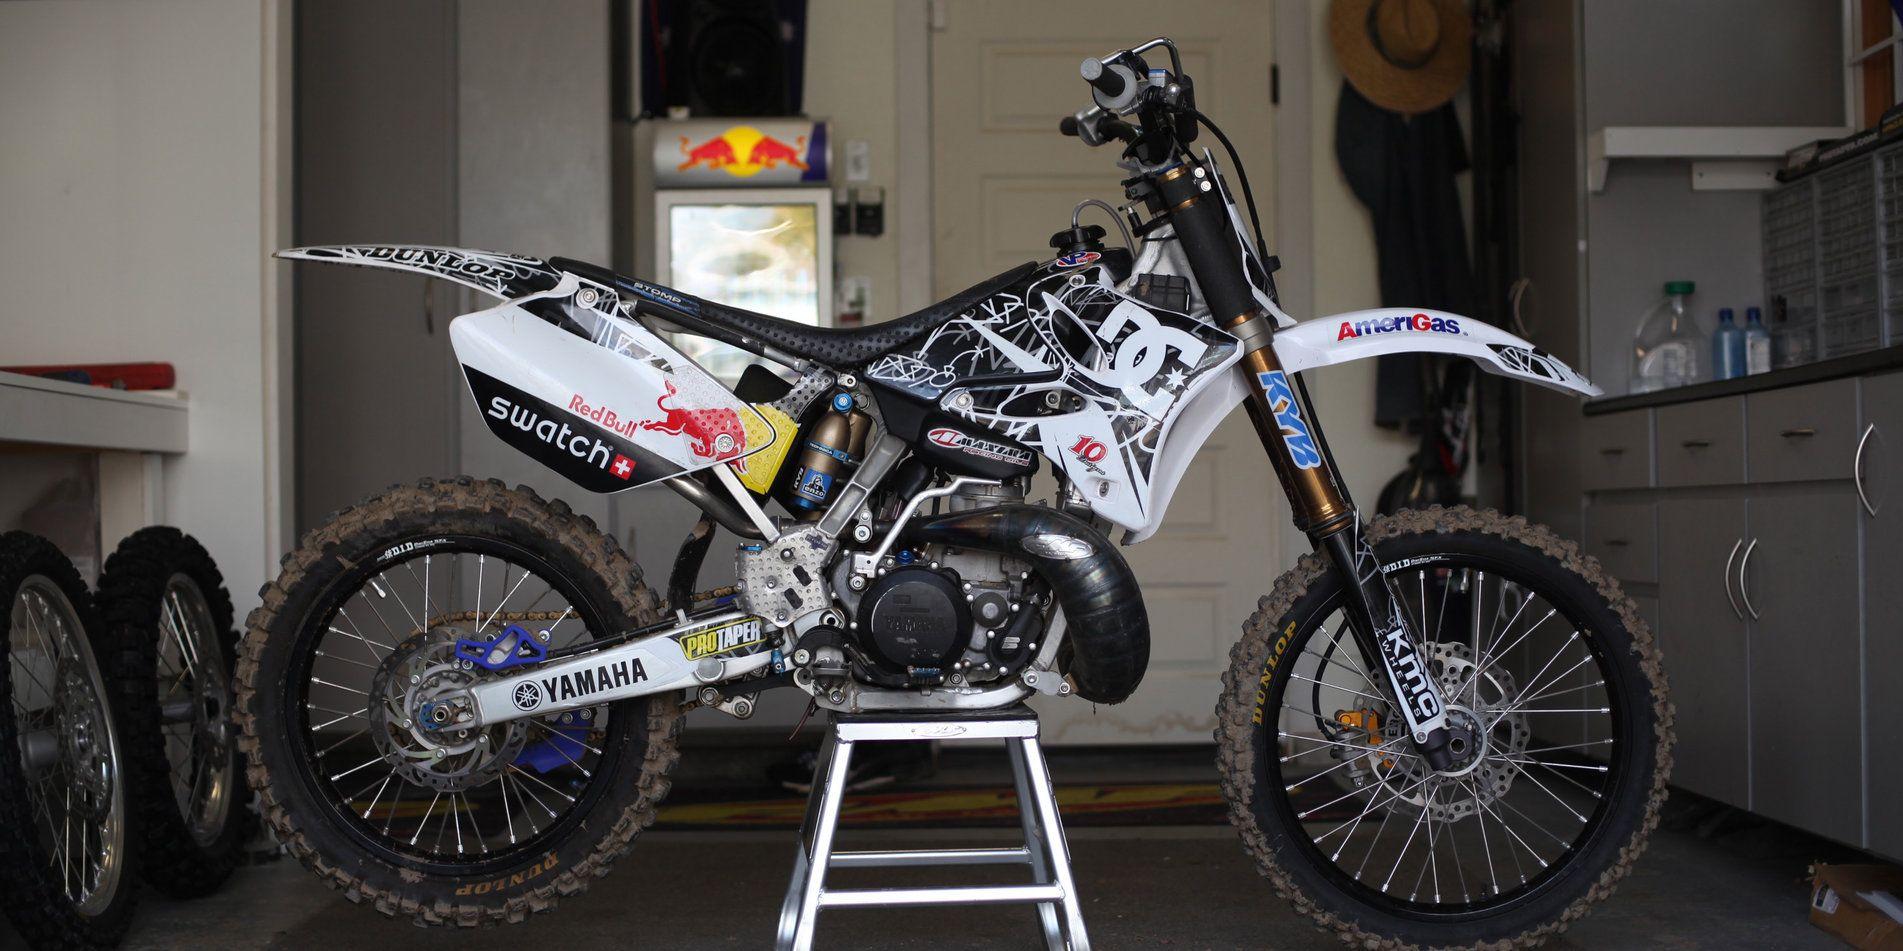 Yamaha Yz 250 Robbie Maddison Supermoto Motocross Custom Cycles